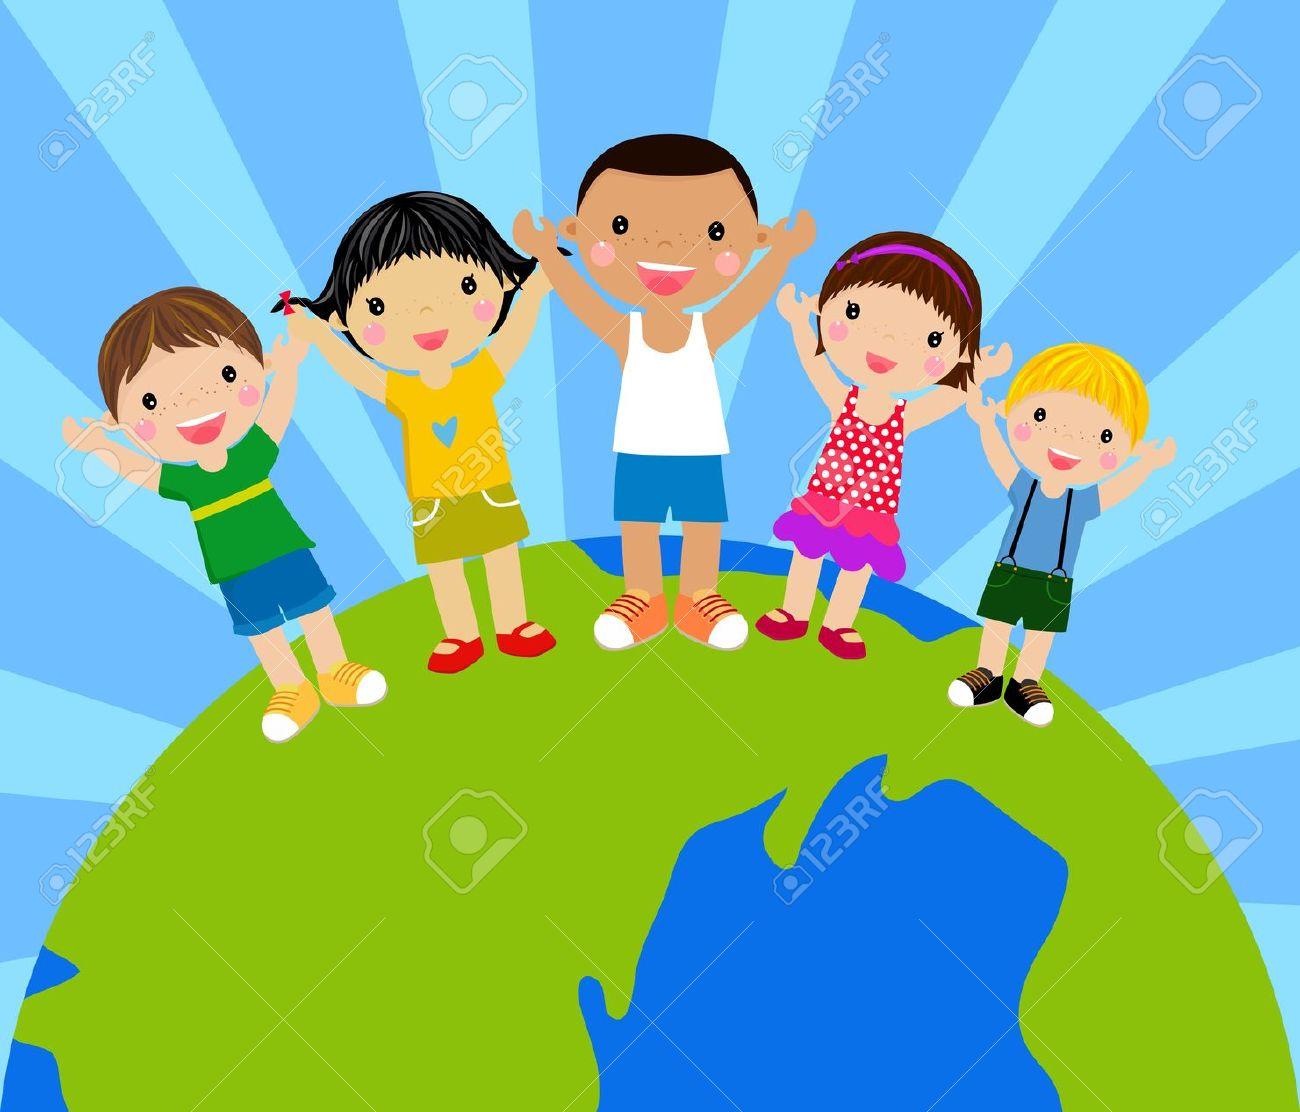 children holding hands color clipart #5